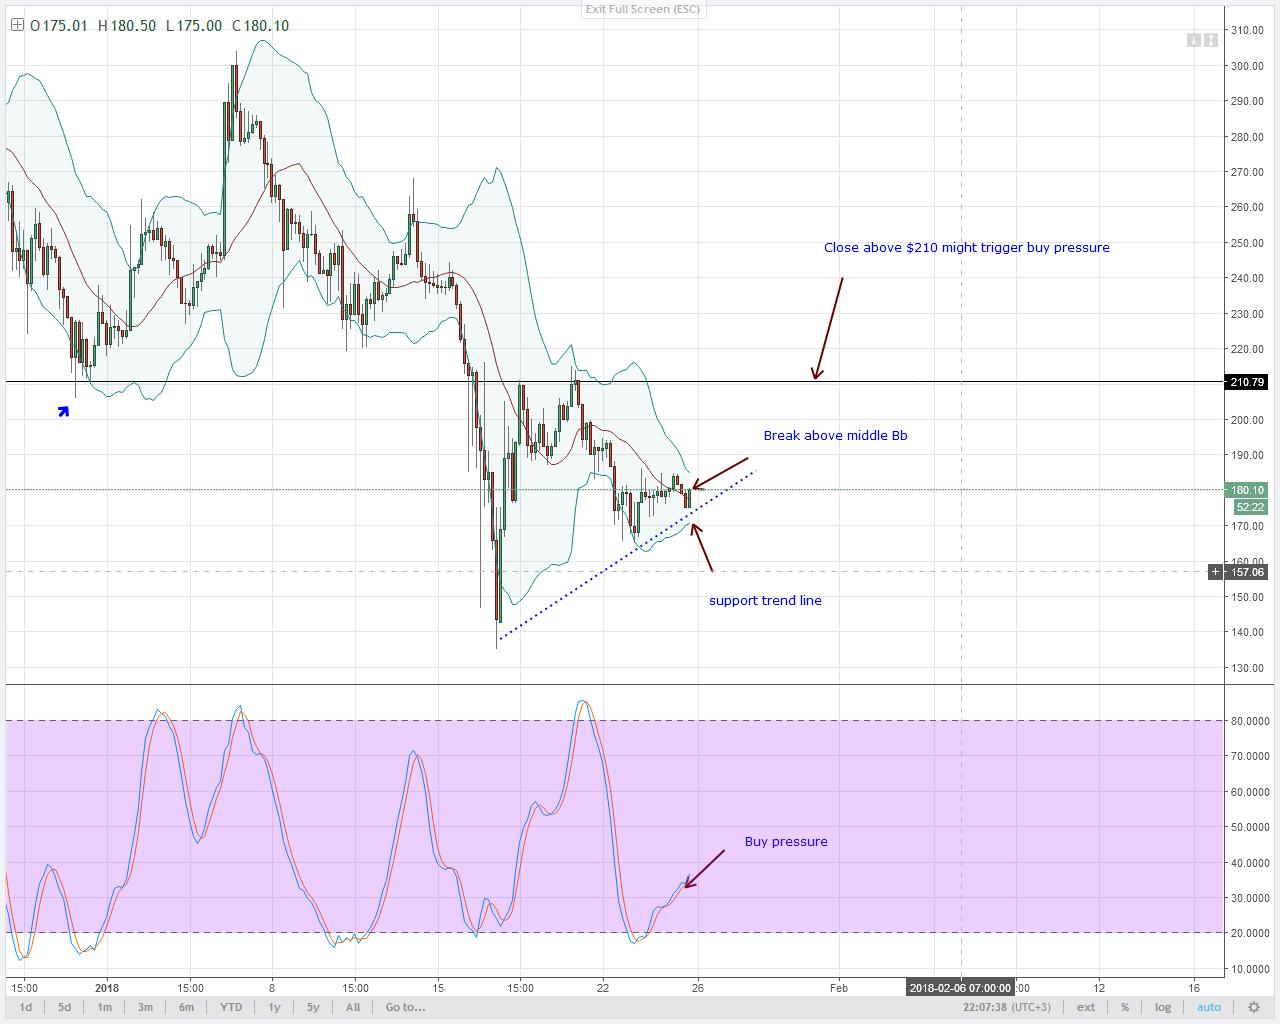 LTC Analysis-Buy pressure